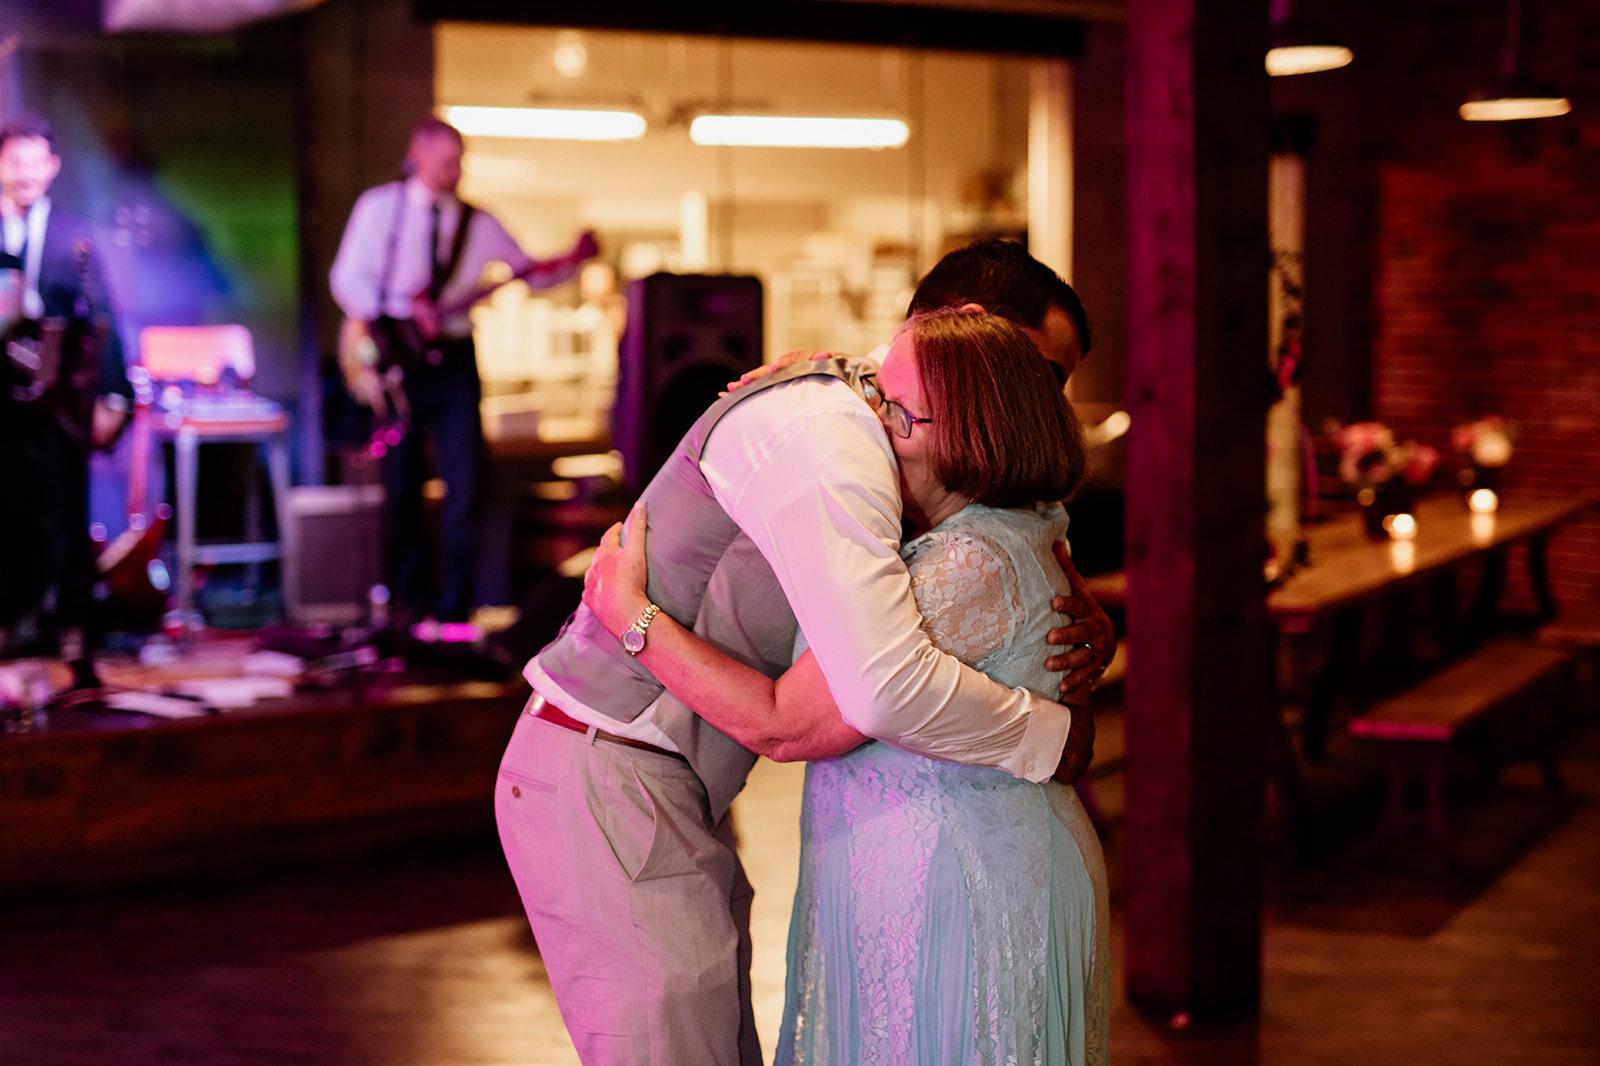 Mother son dance during an elopement reception.